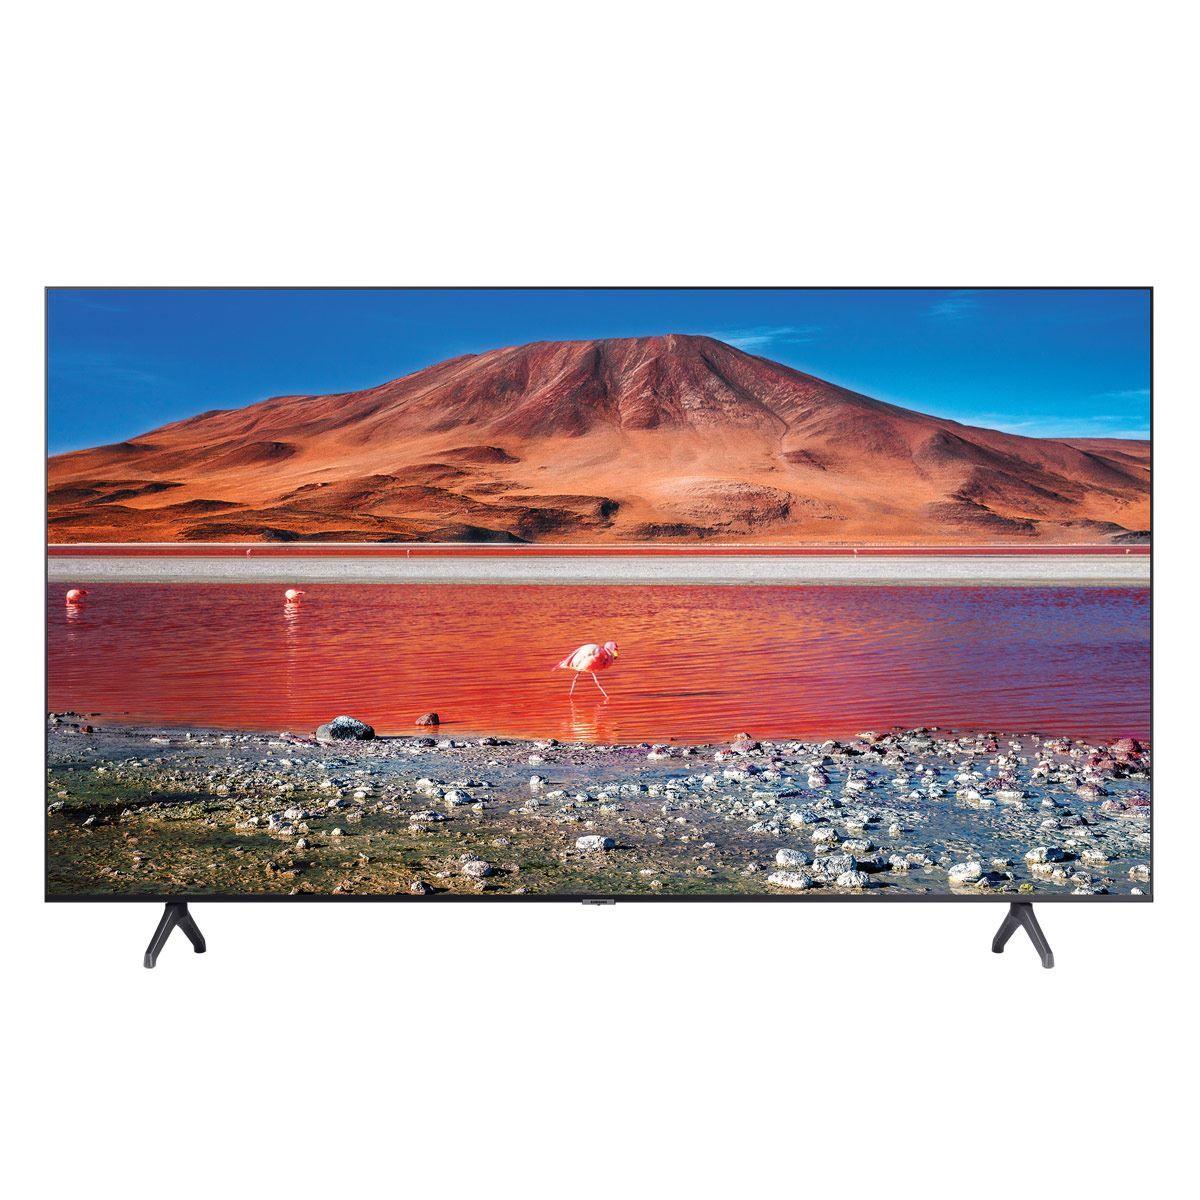 "Claro shop:Pantalla Samsung UN43TU7000FXZX 43"" Crystal UHD 4K (Banorte)"